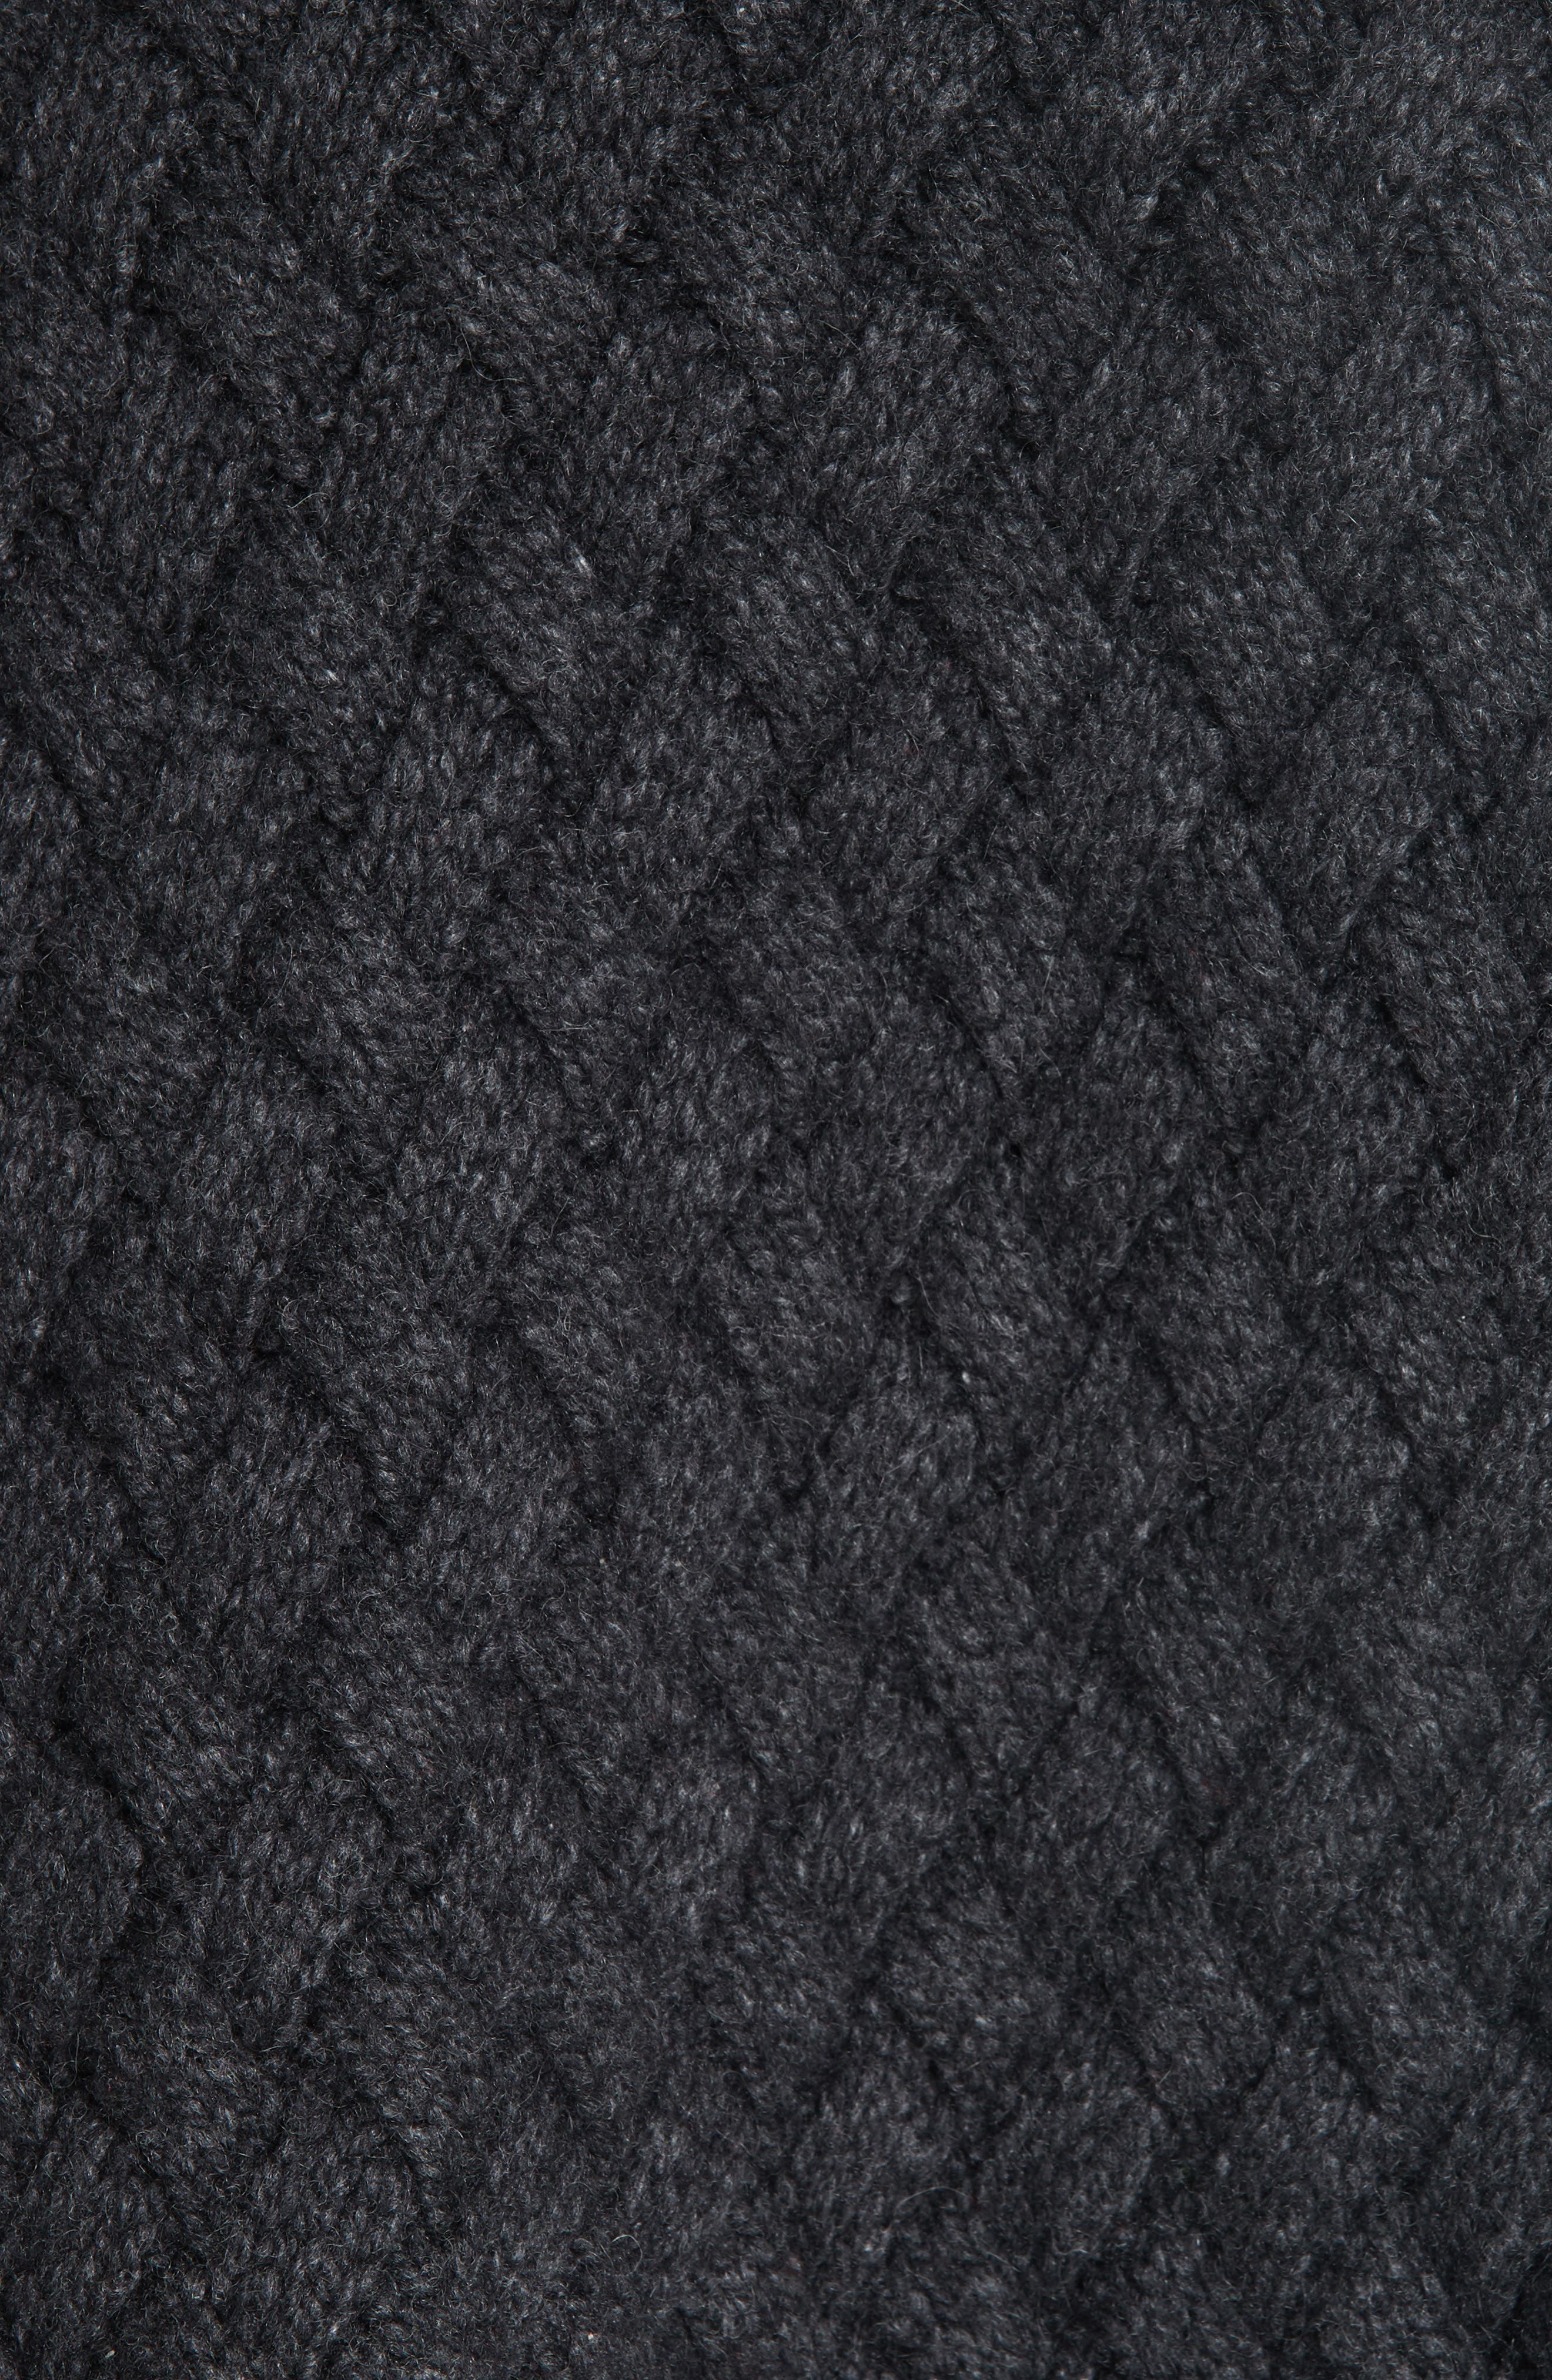 Oversized Braided Cashmere Sweater,                             Alternate thumbnail 6, color,                             DARK GREY